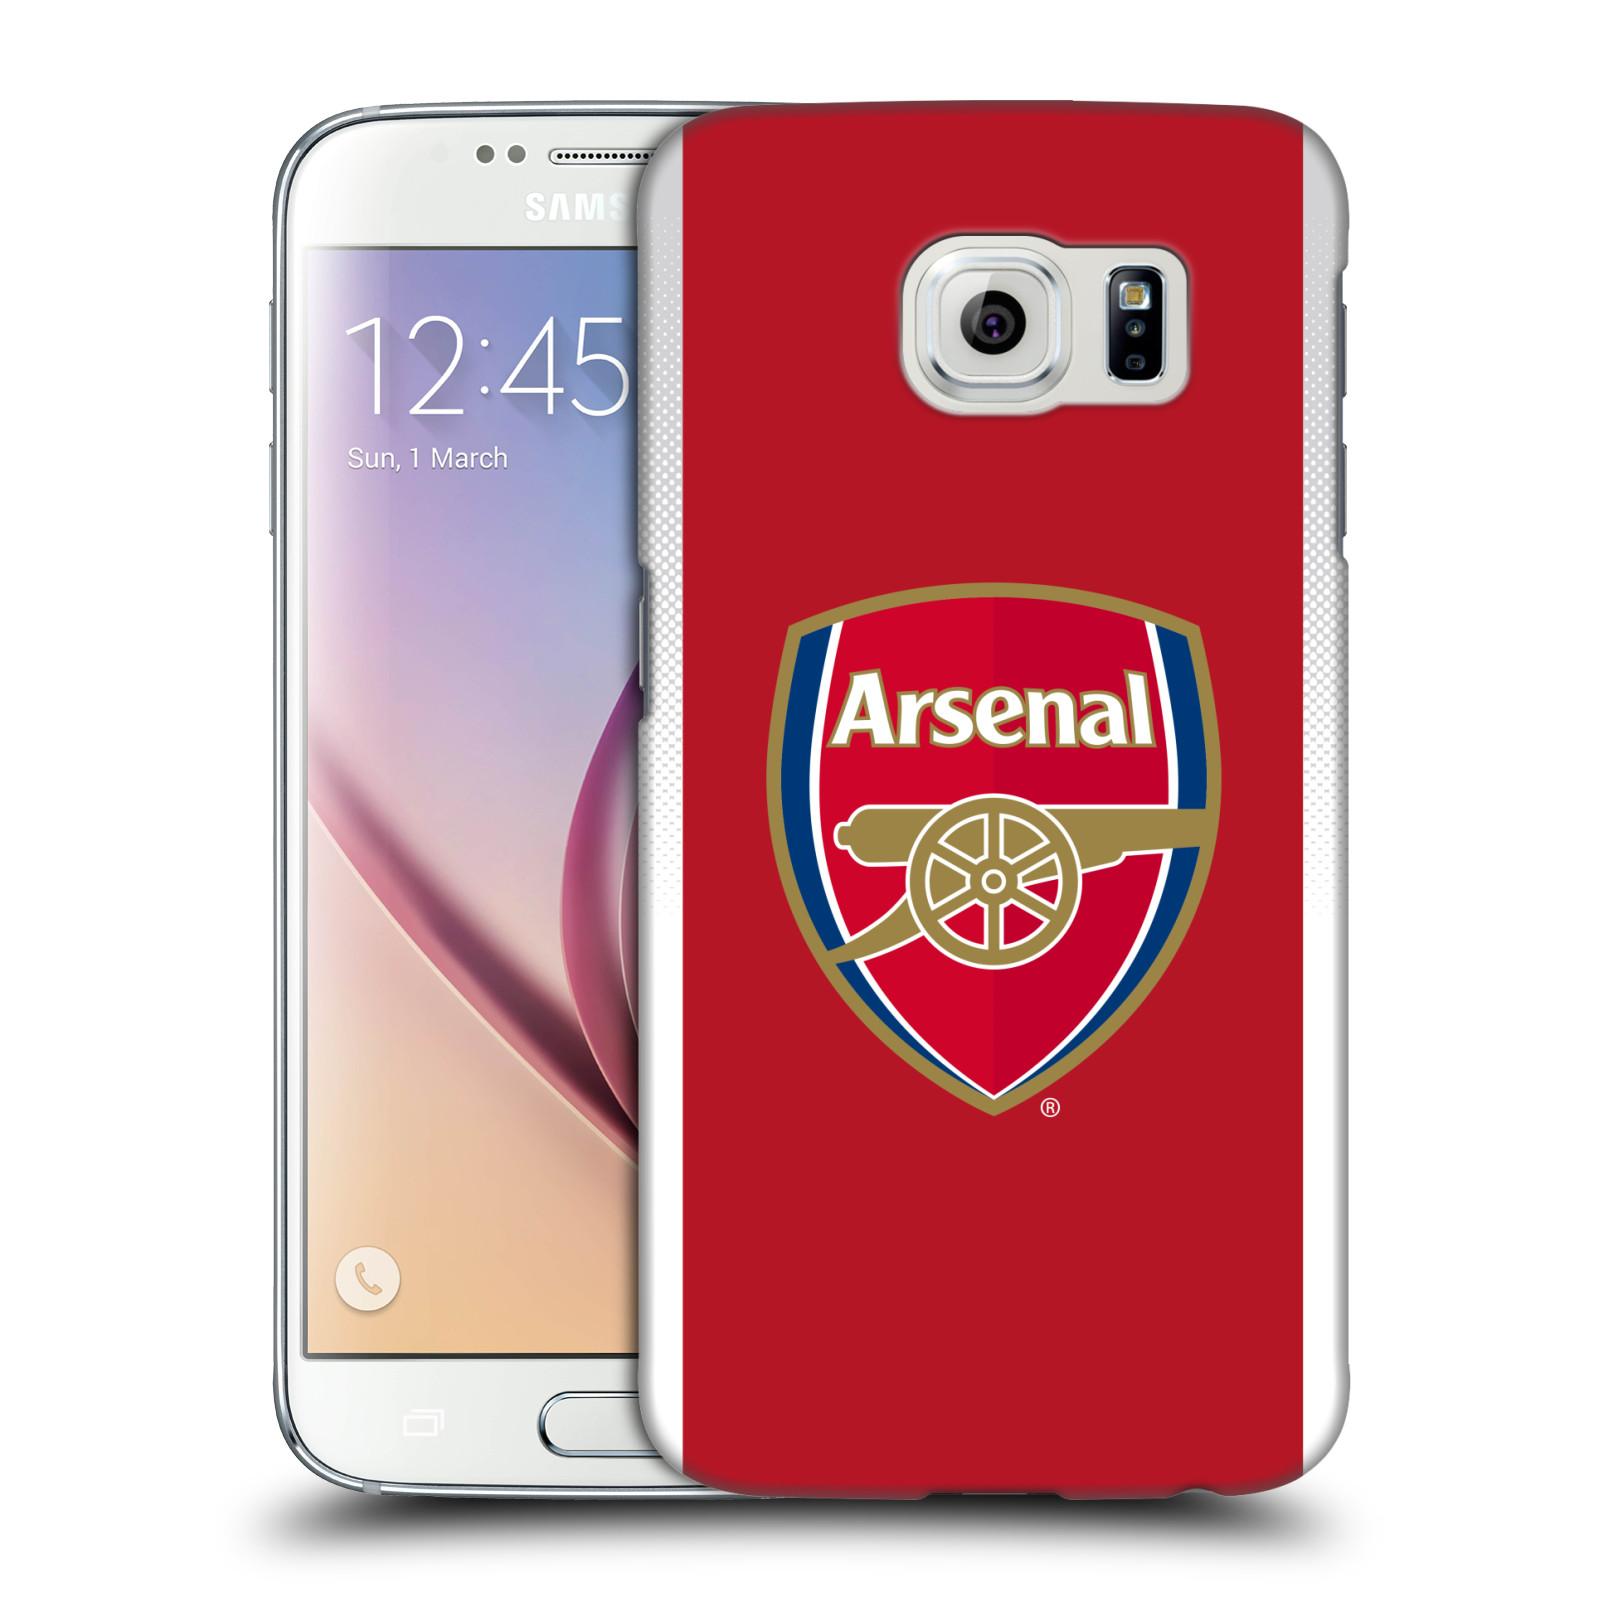 Plastové pouzdro na mobil Samsung Galaxy S6 - Head Case - Arsenal FC - Logo klubu